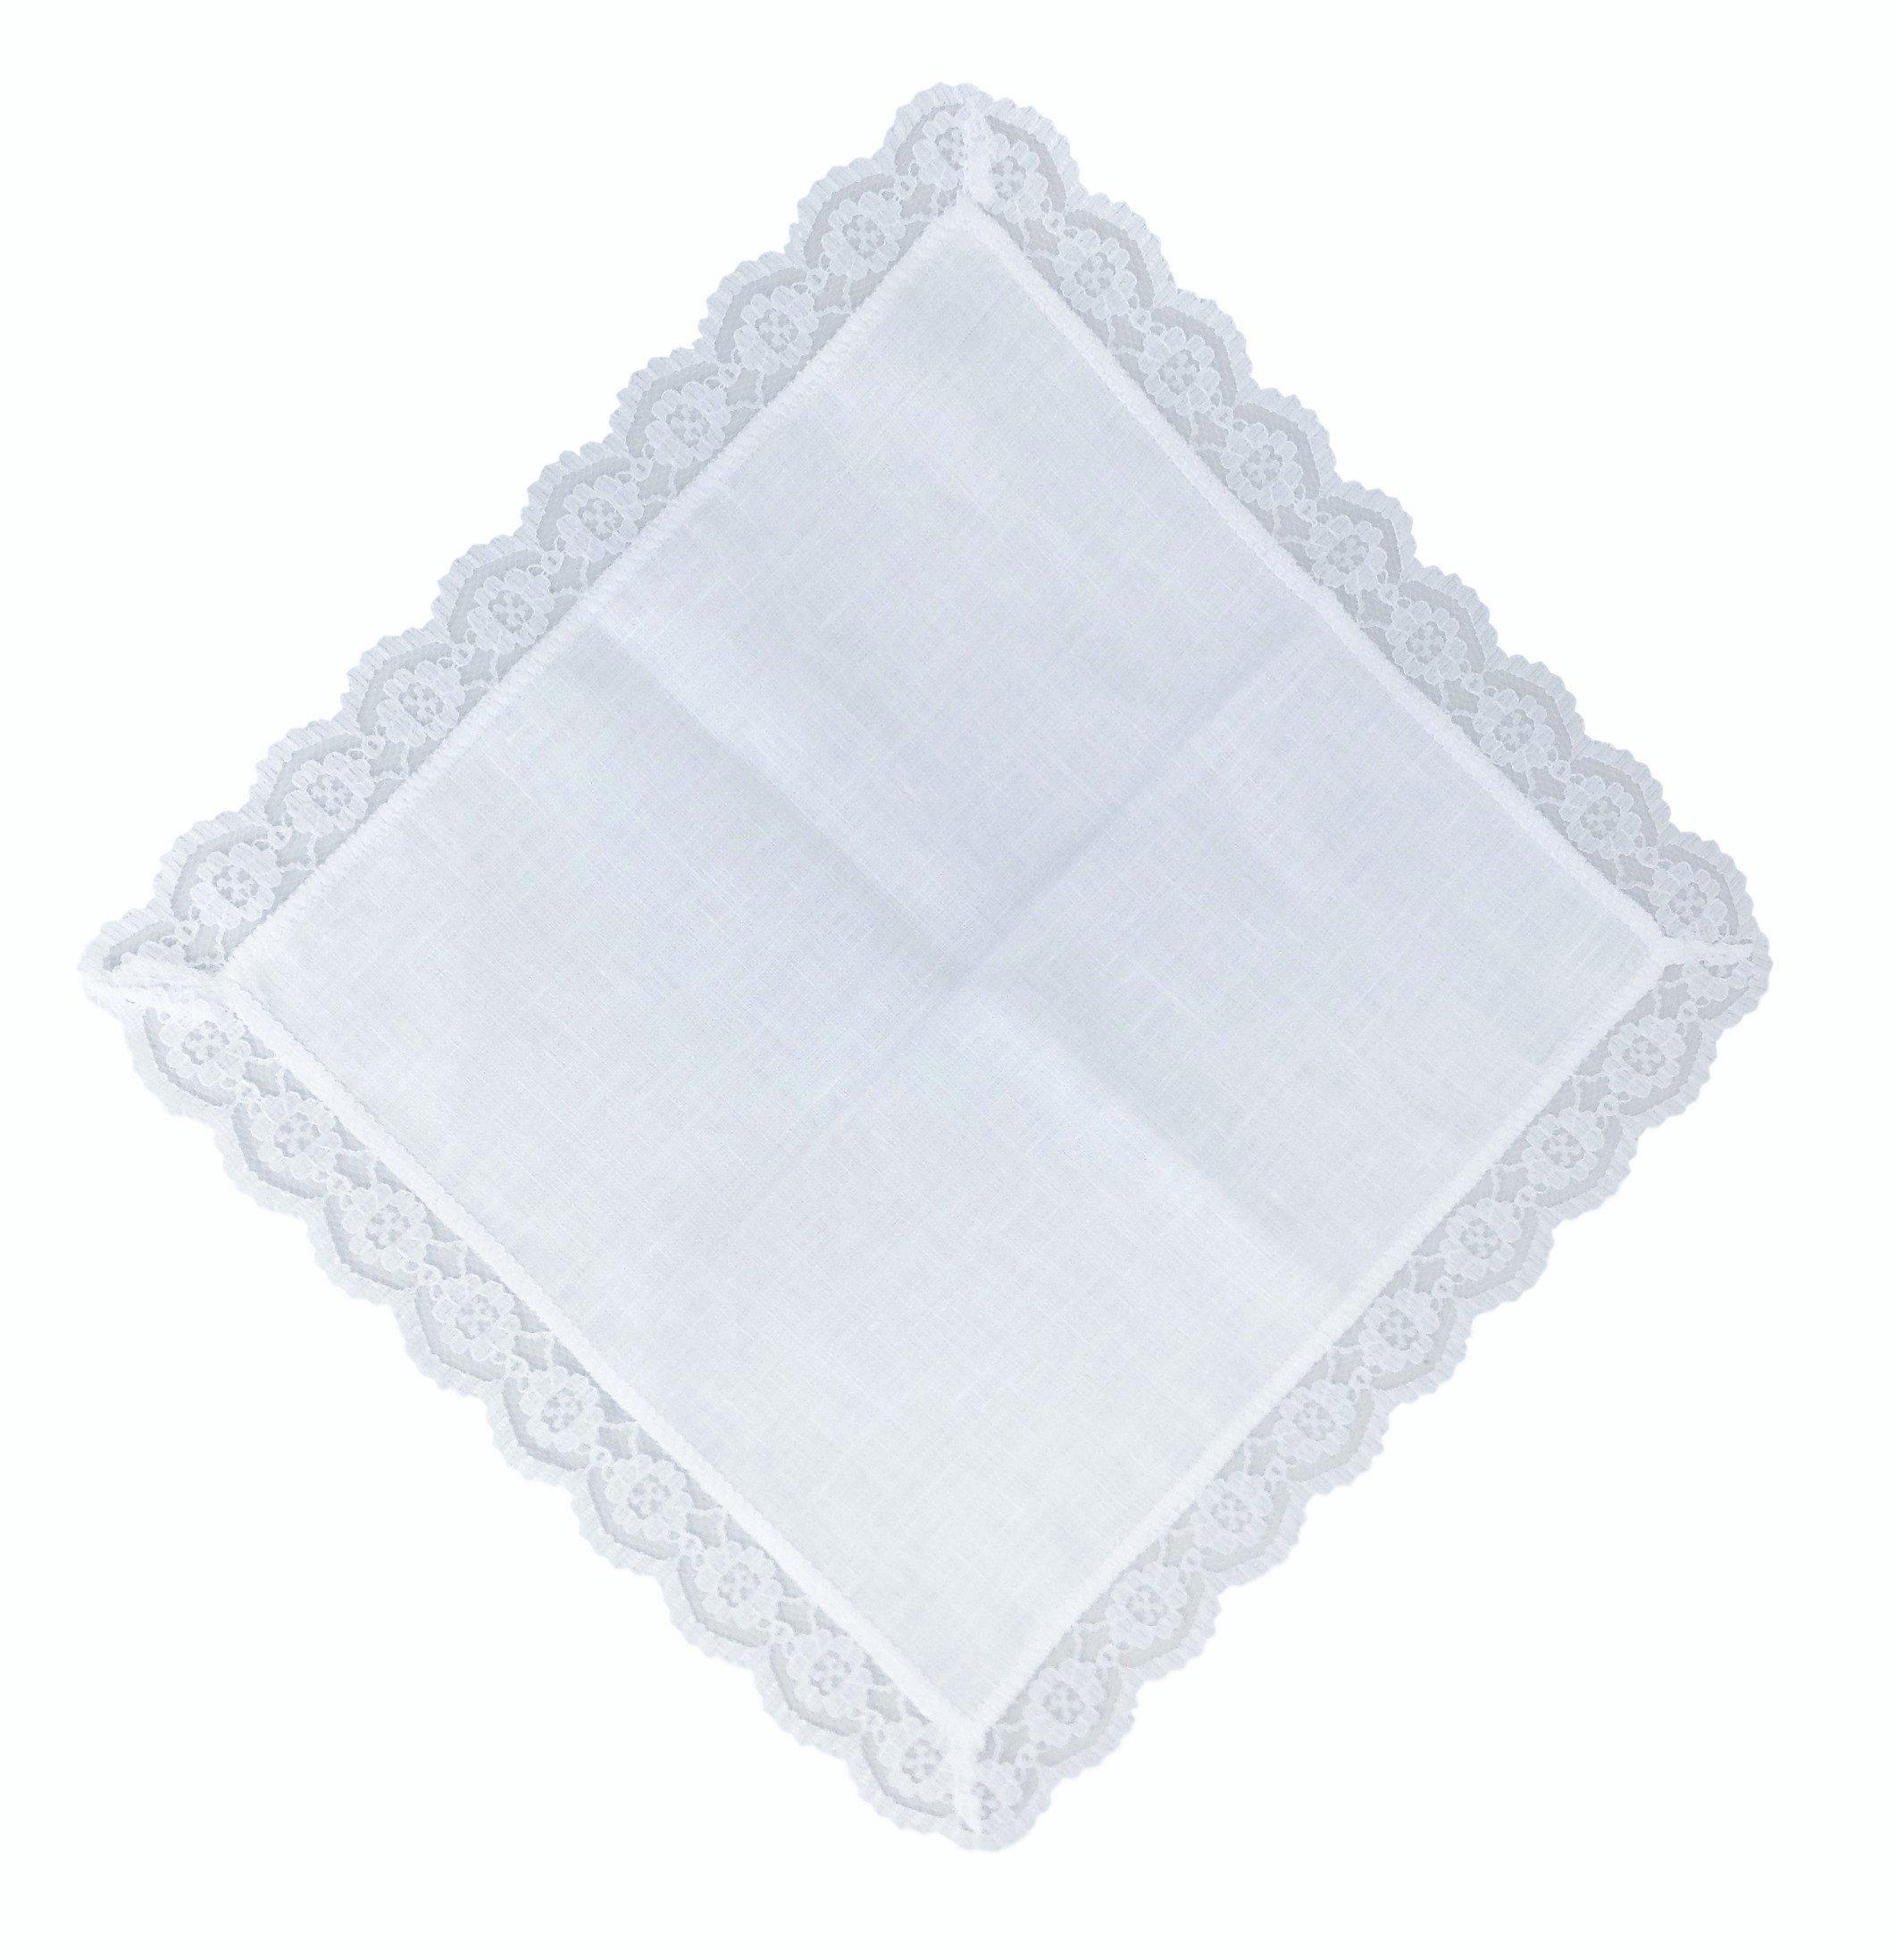 Thomas Ferguson - Ladies White Irish Linen Handkerchief - Pack of 3 In Gift Box by Thomas Ferguson Irish Linen (Image #3)